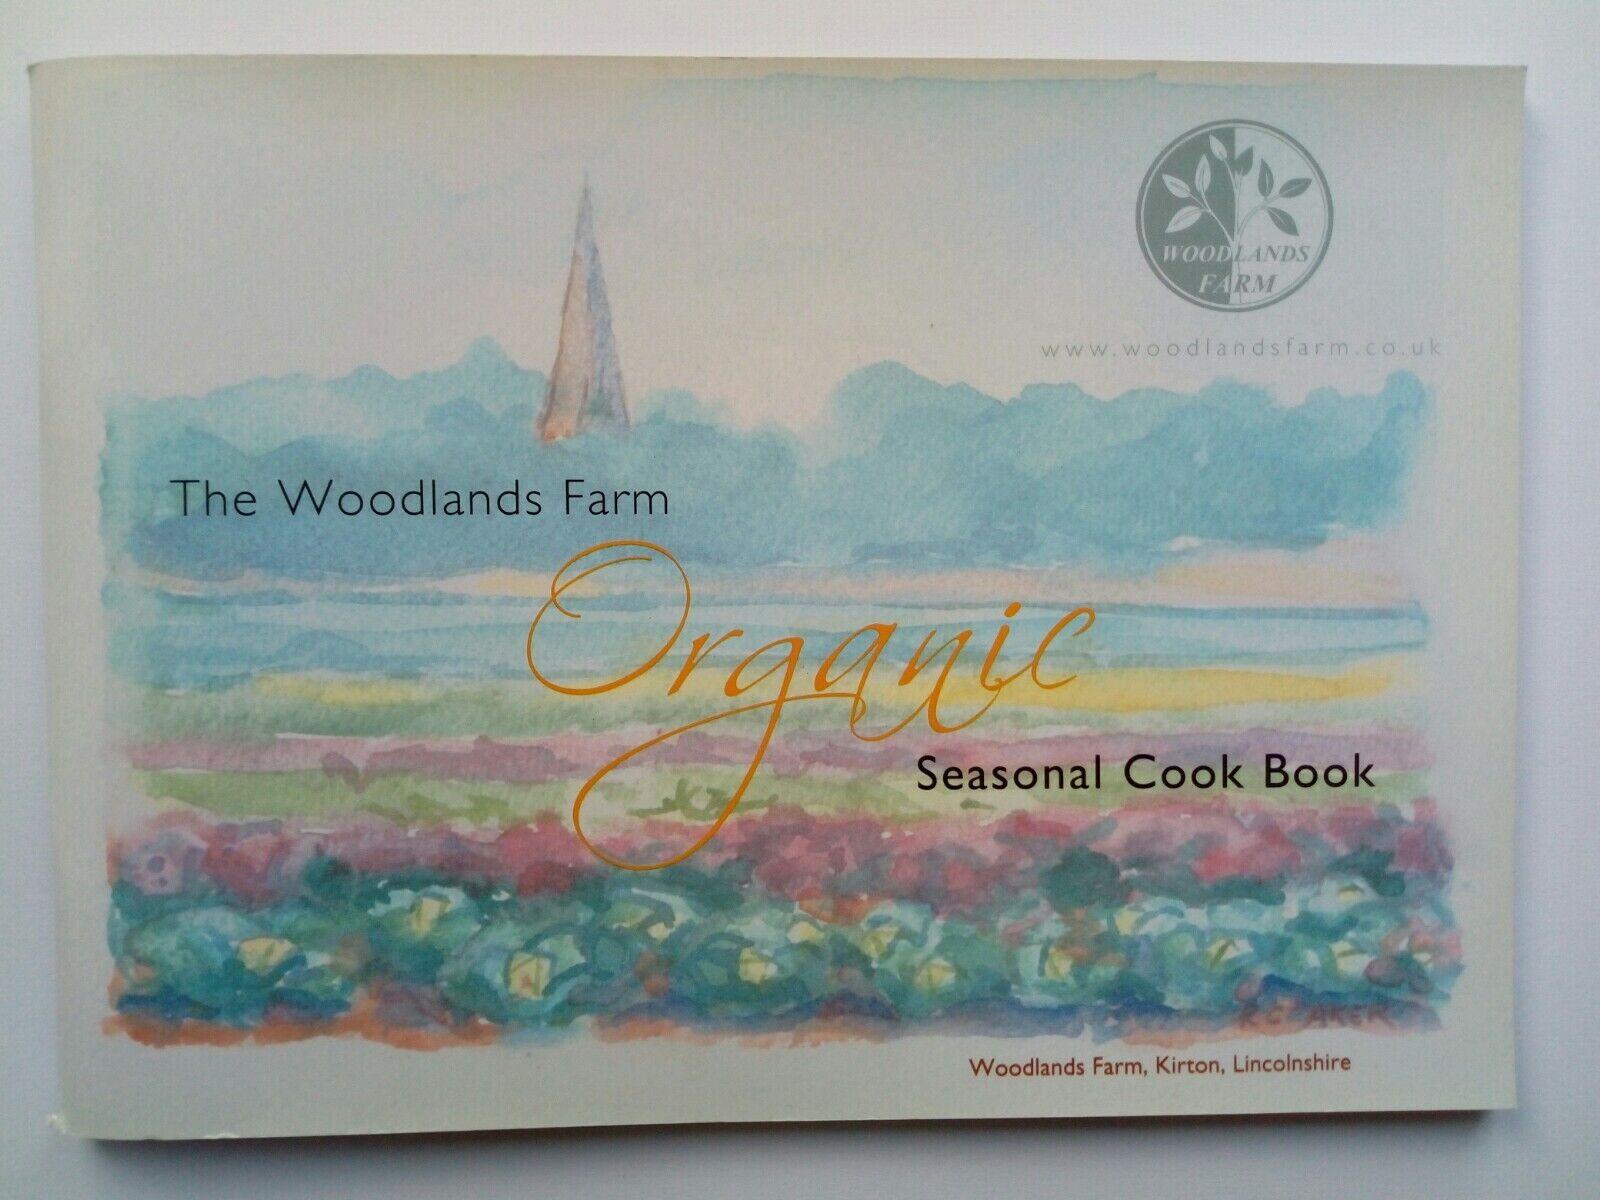 The Woodlands Farm Organic Seasonal Cook Book. Approx 90 recipes.